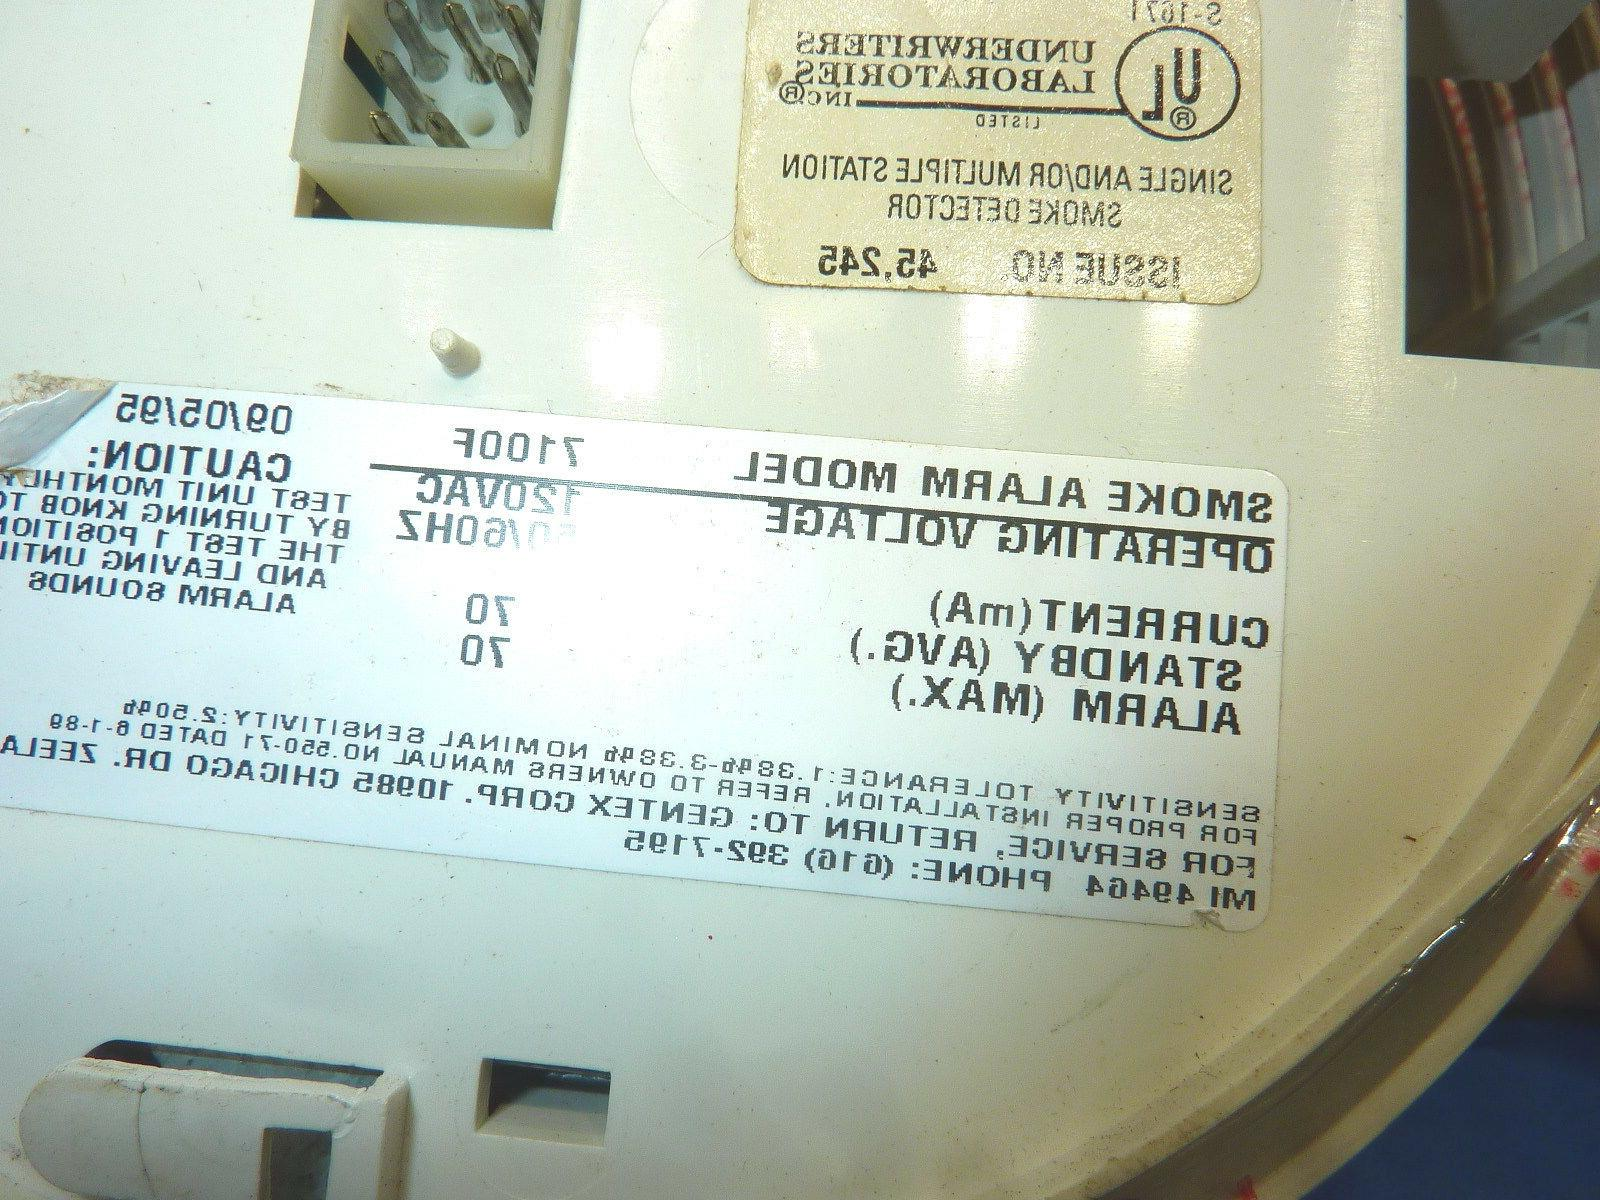 Gentex Corporation 907-1104-002 Smoke 7100F